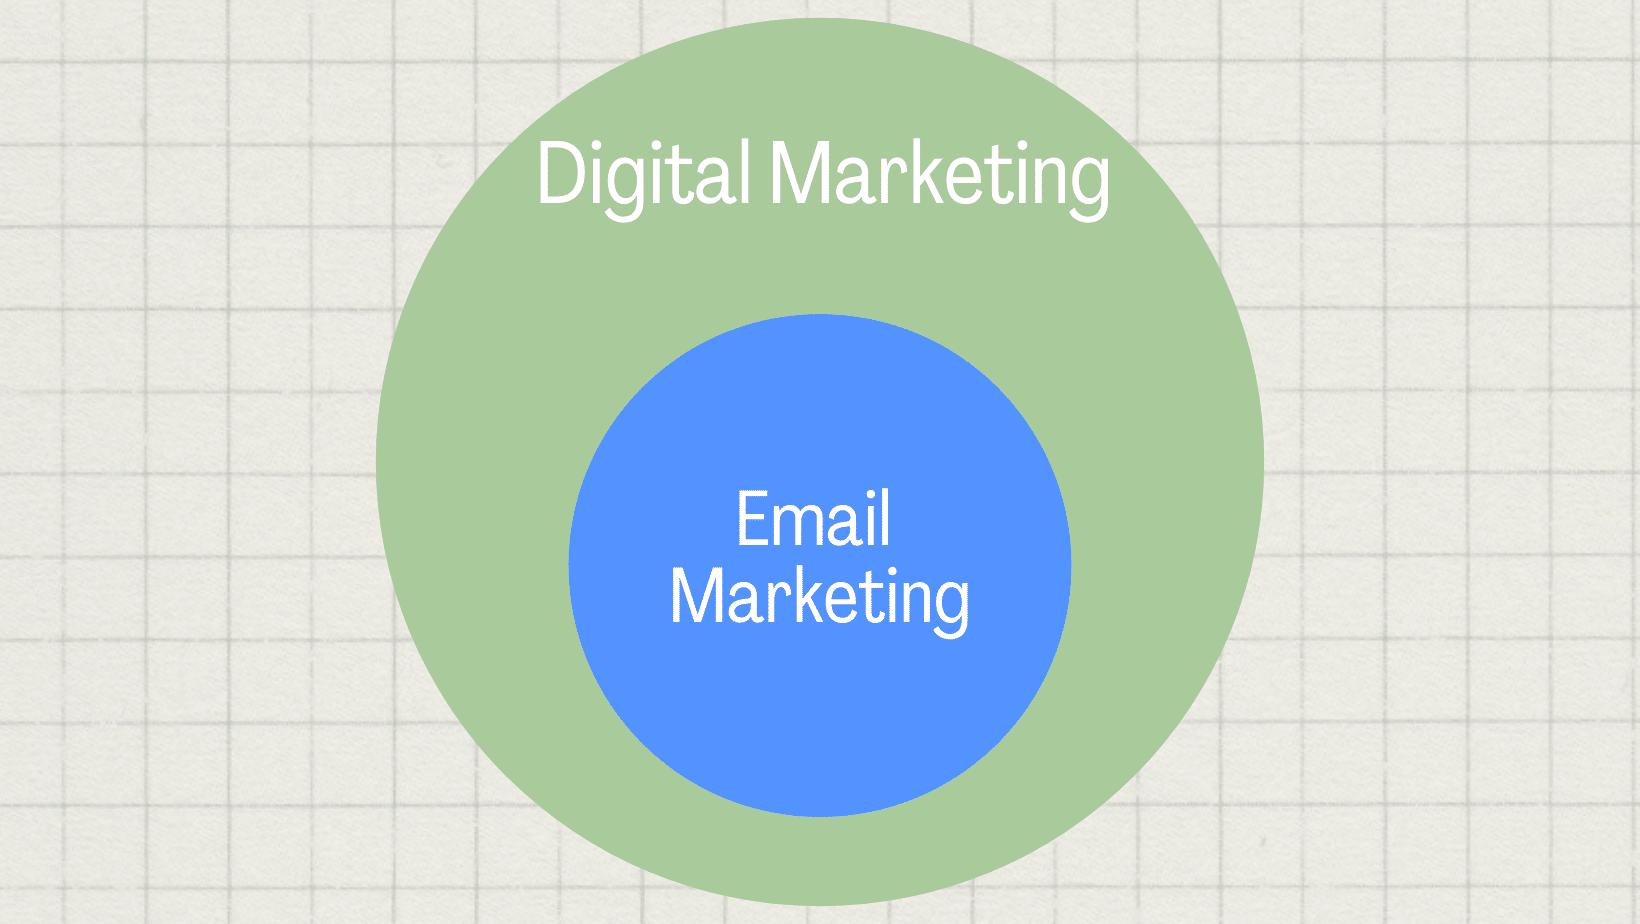 Circle chart of email marketing within digital marketing